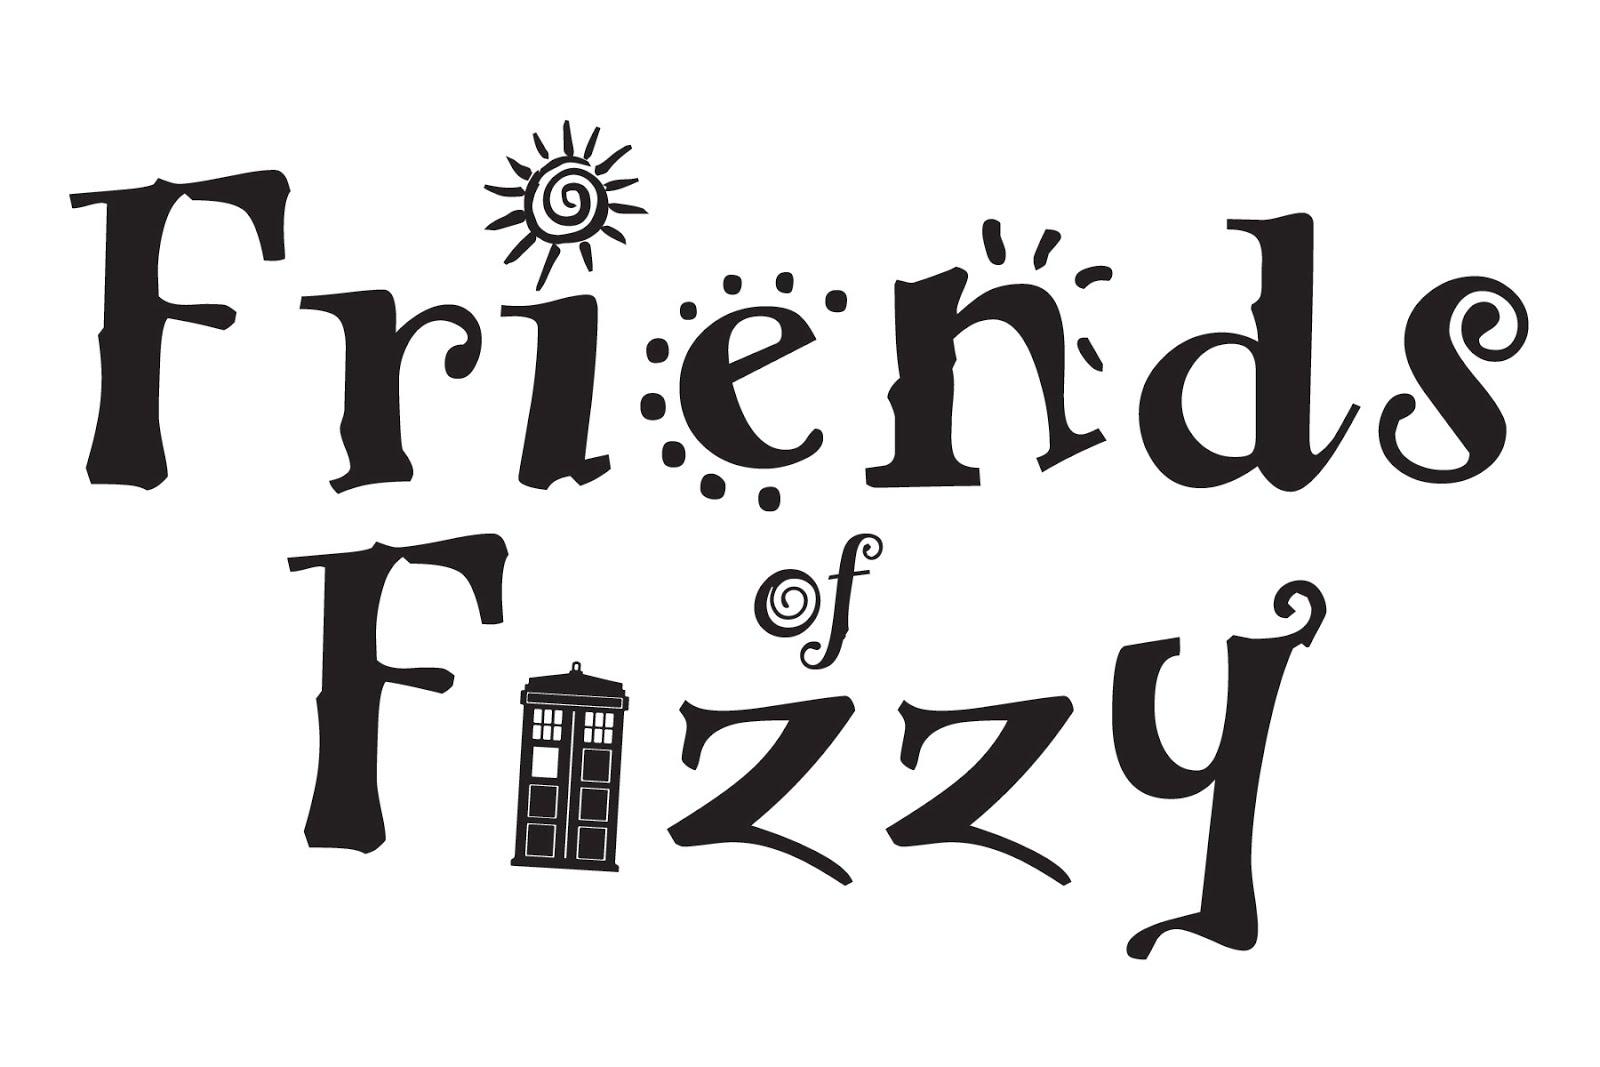 #FriendsOfFizzy